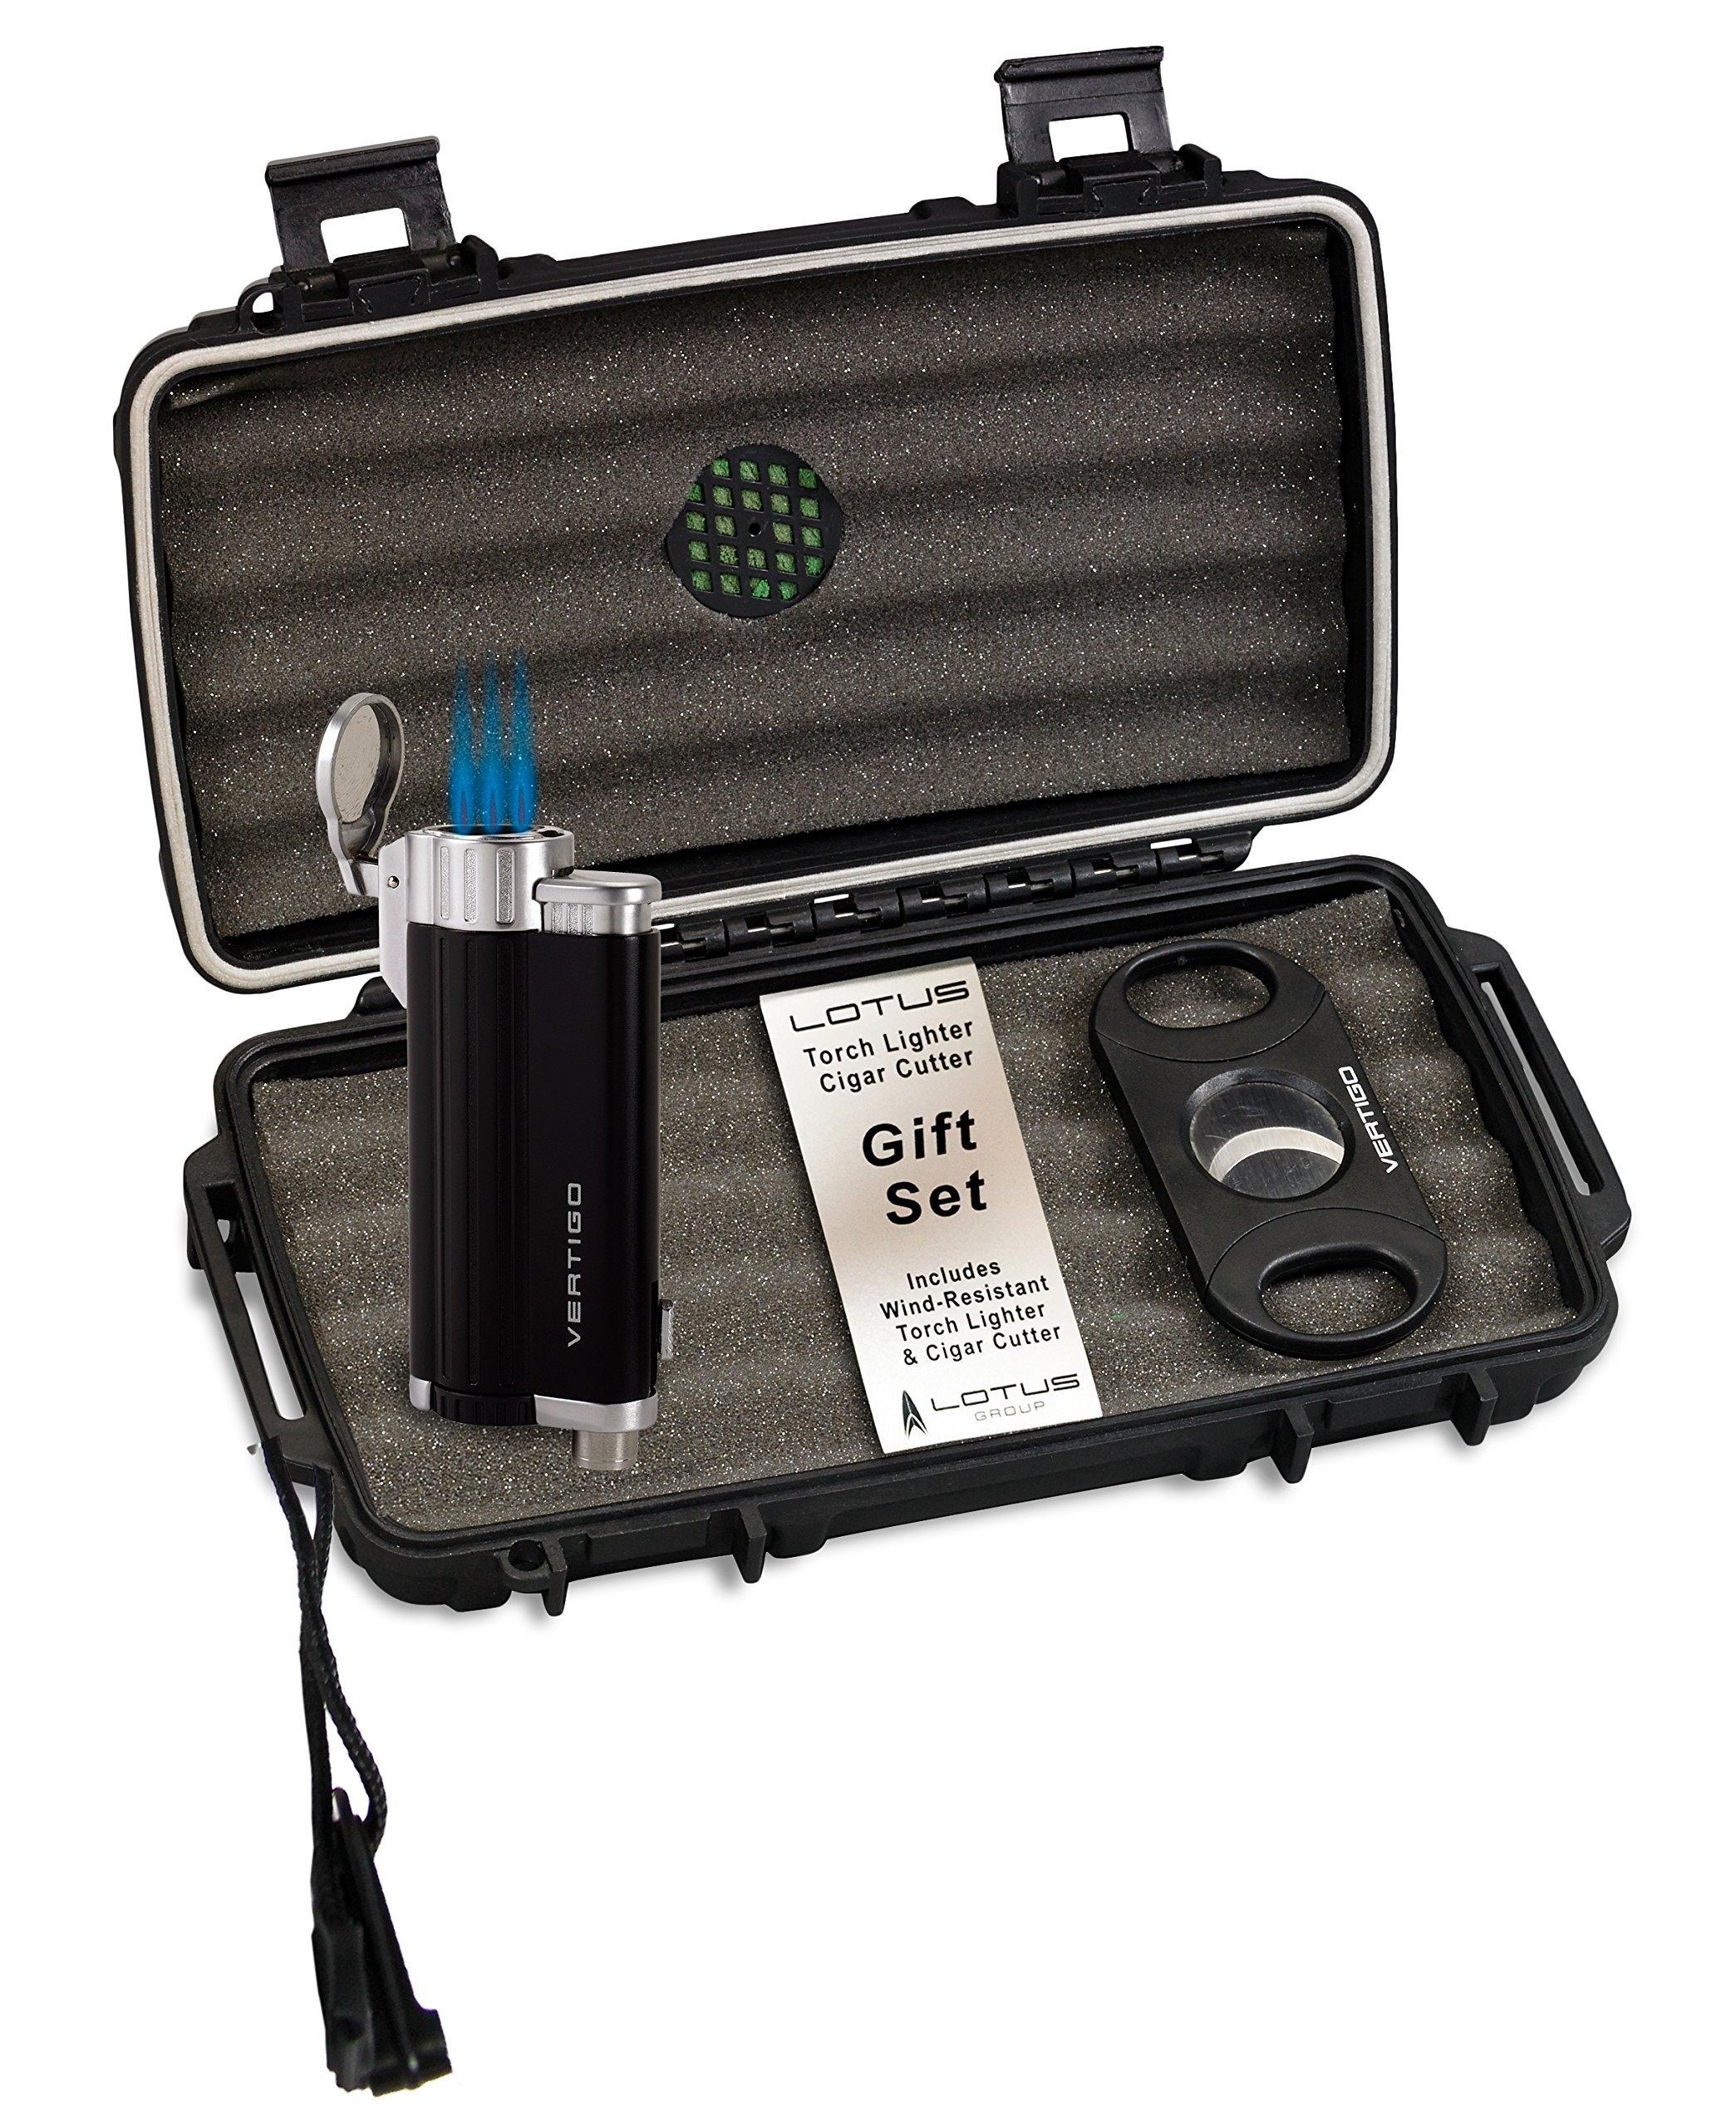 Lotus VGS Travel Humidor Lighter Cutter Set